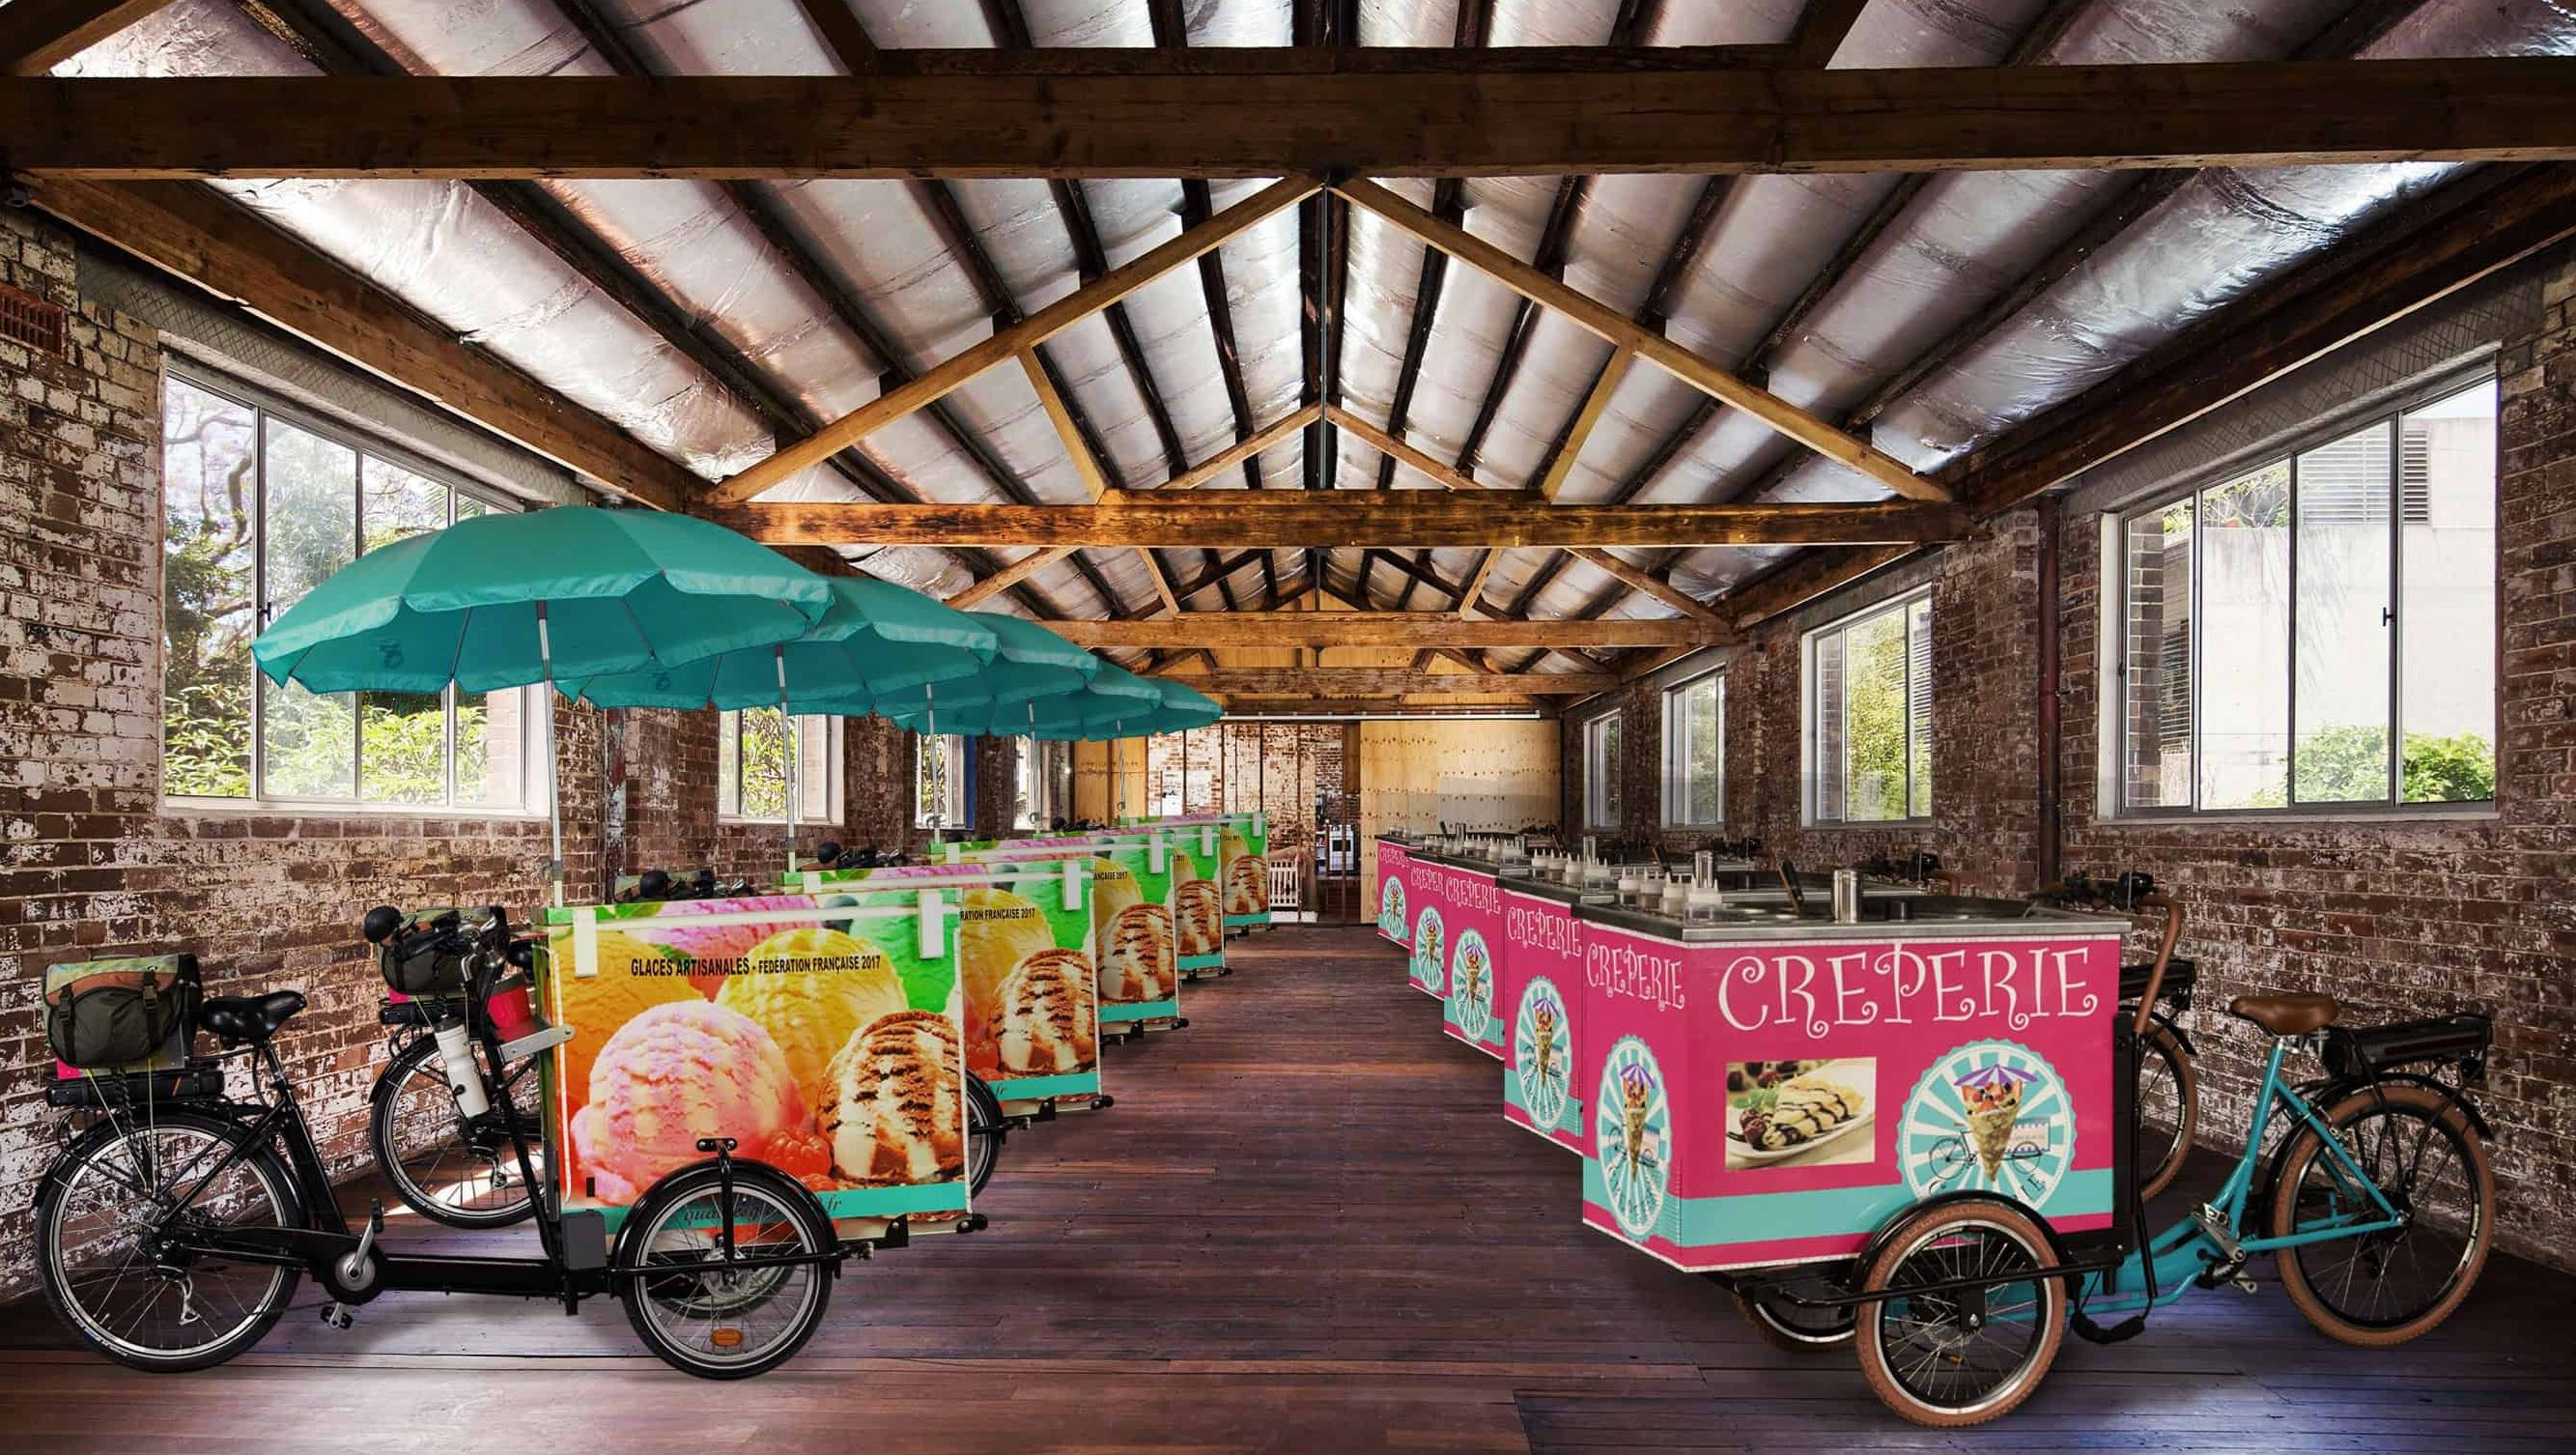 velo-triporteur-glace-professionnel-vitrine-refrigeree-glaces-artisanales-vente-ambulante-quai-des-glaces-lyon-animation-evenement-street-marketing